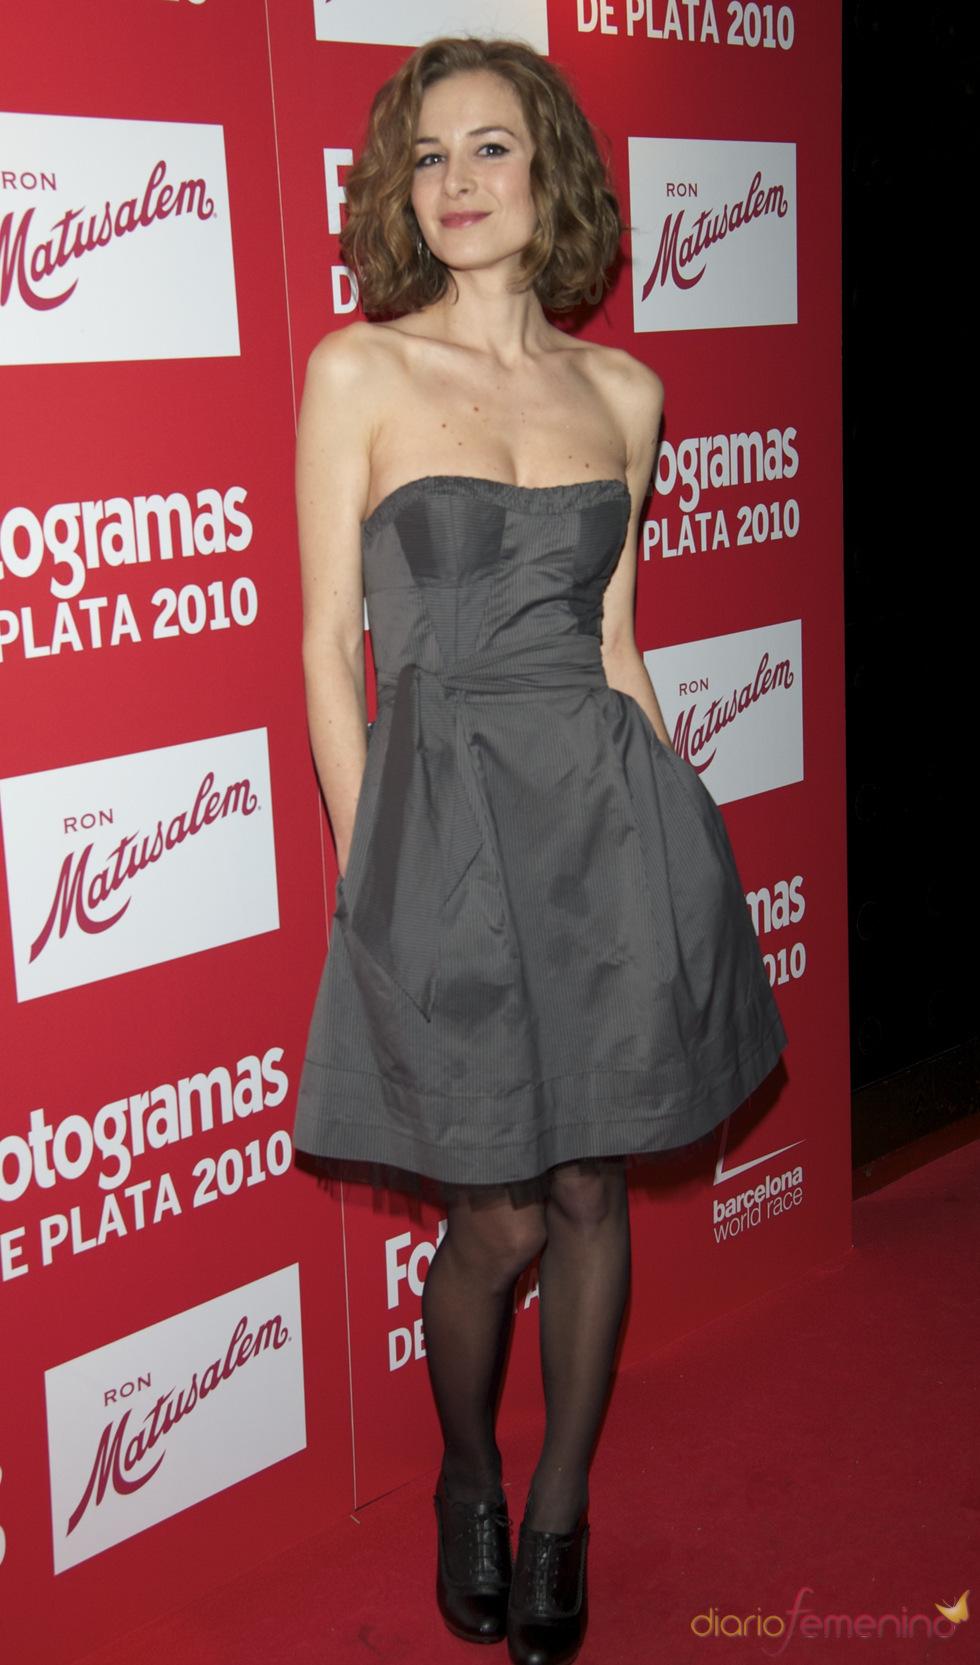 Merce Llorens en los Premios Fotogramas de Plata 2010